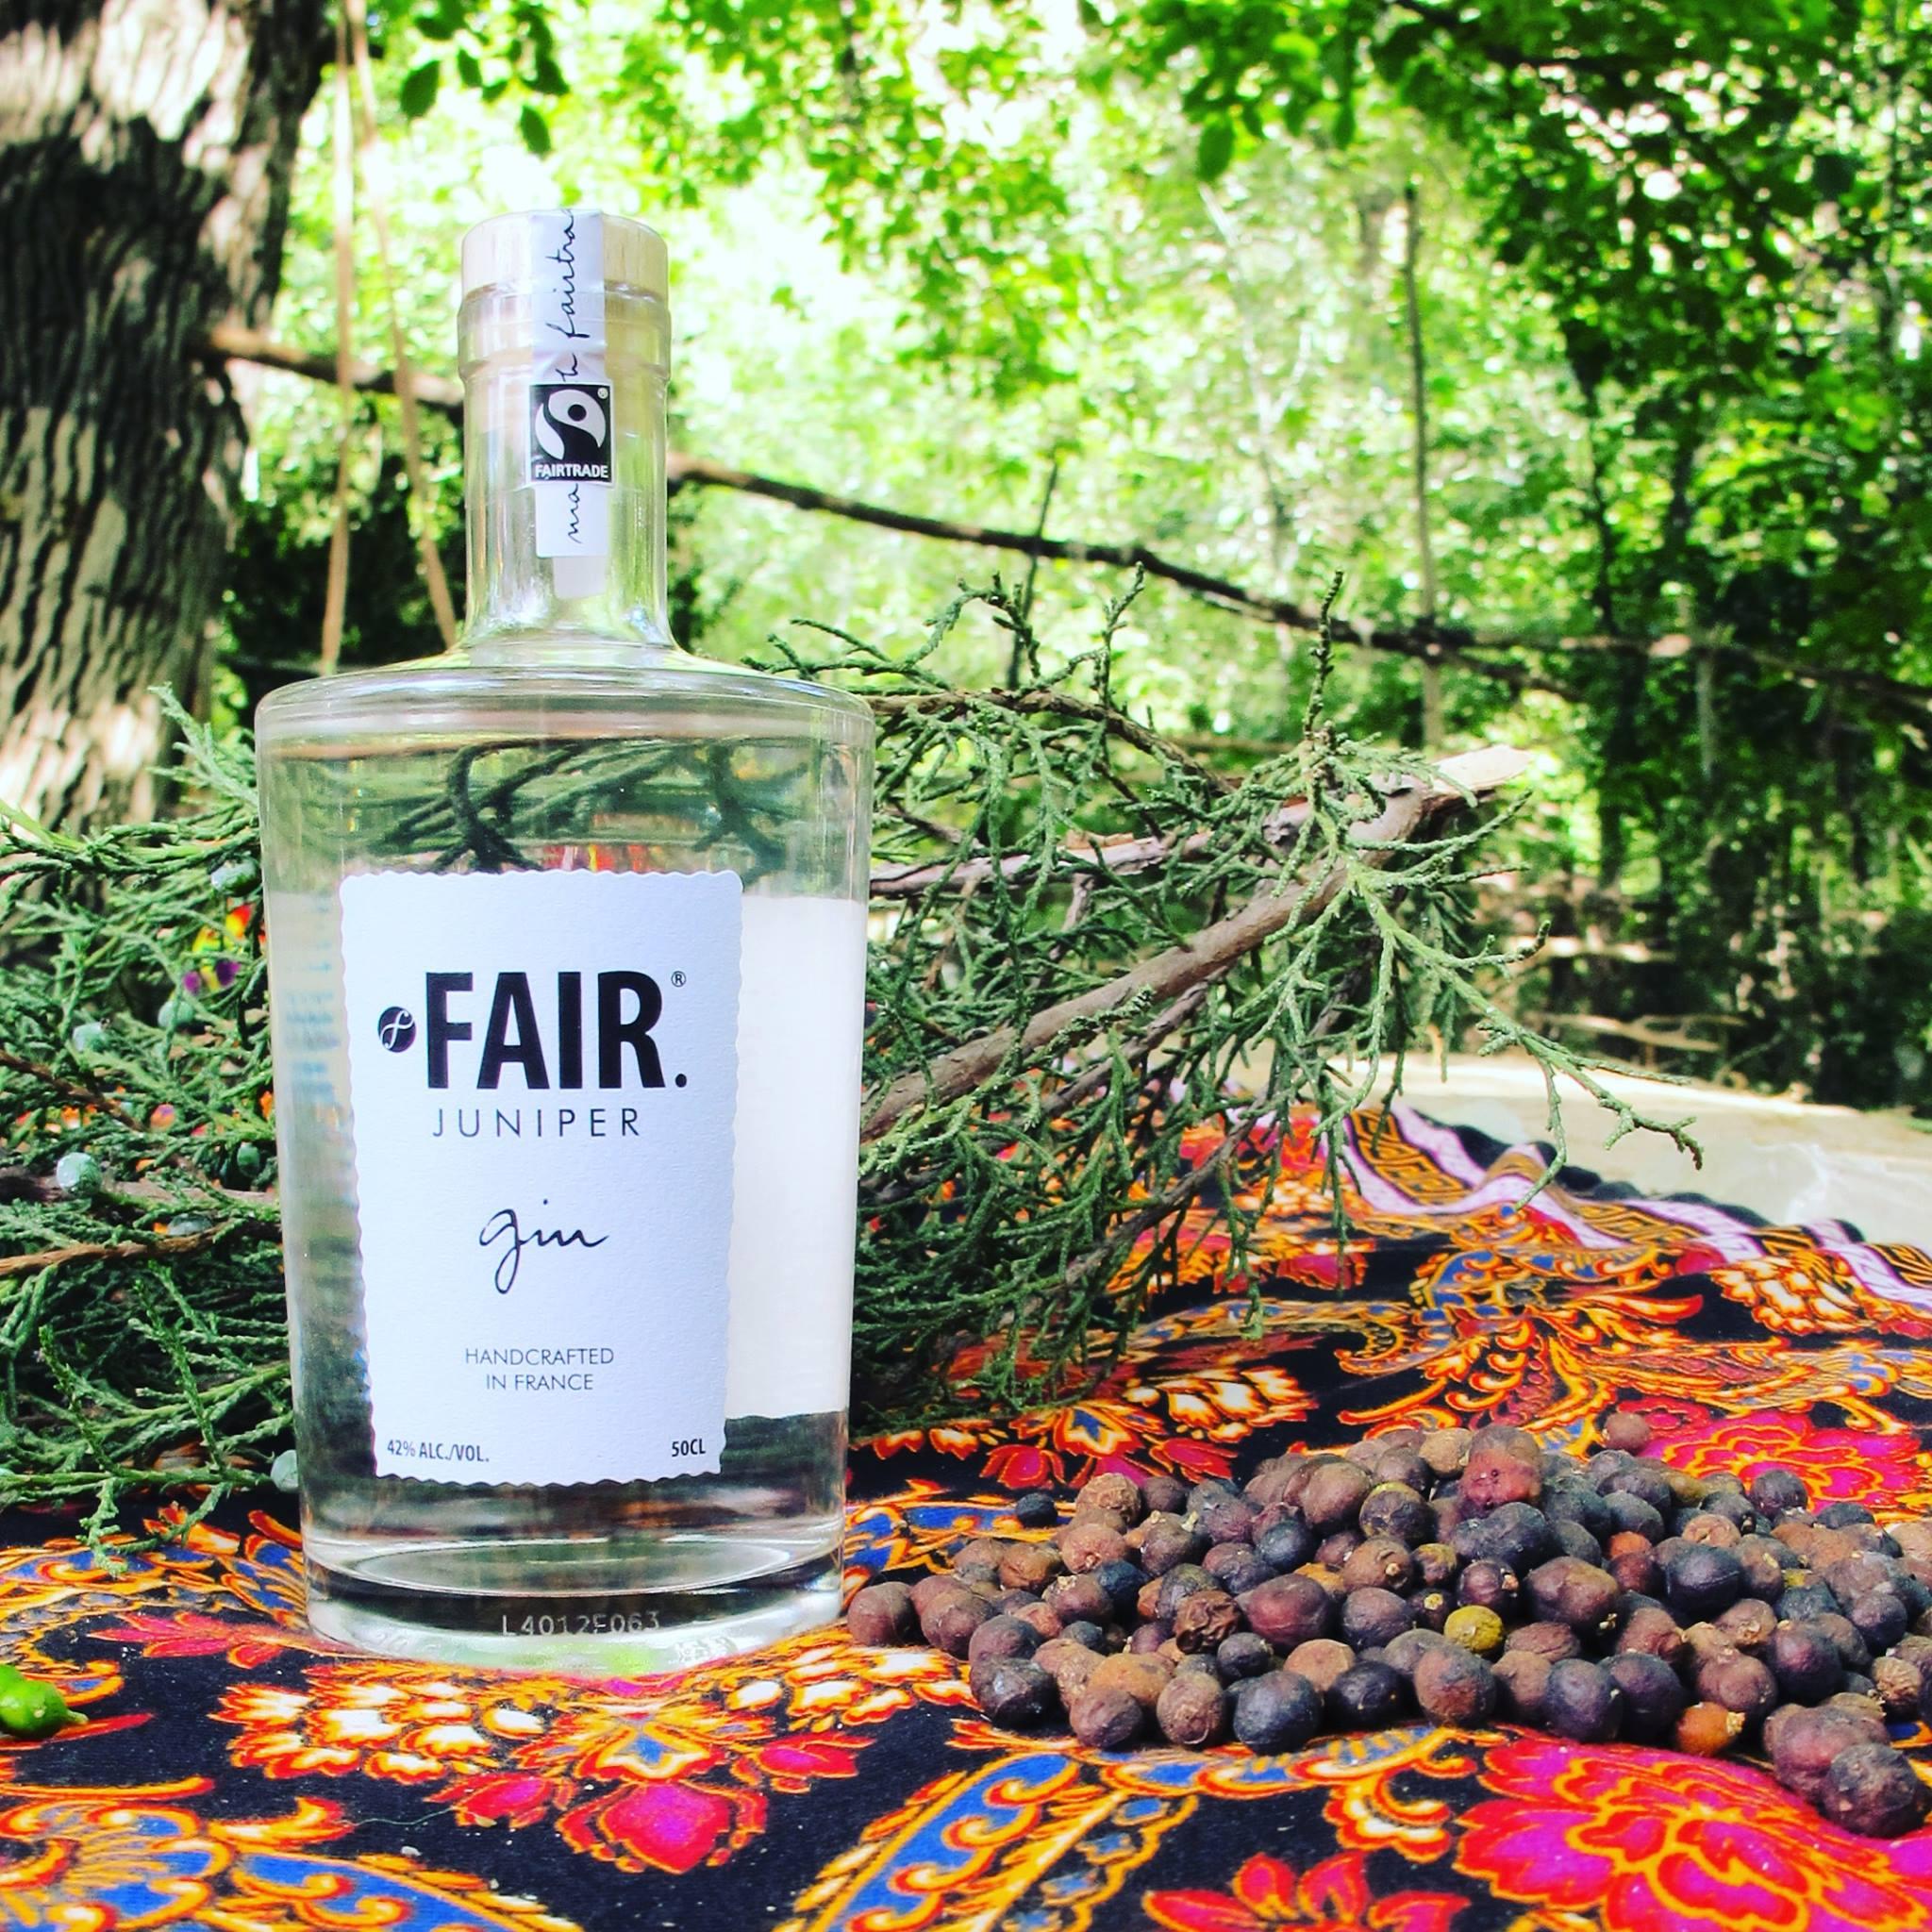 Fair Juniper Gin